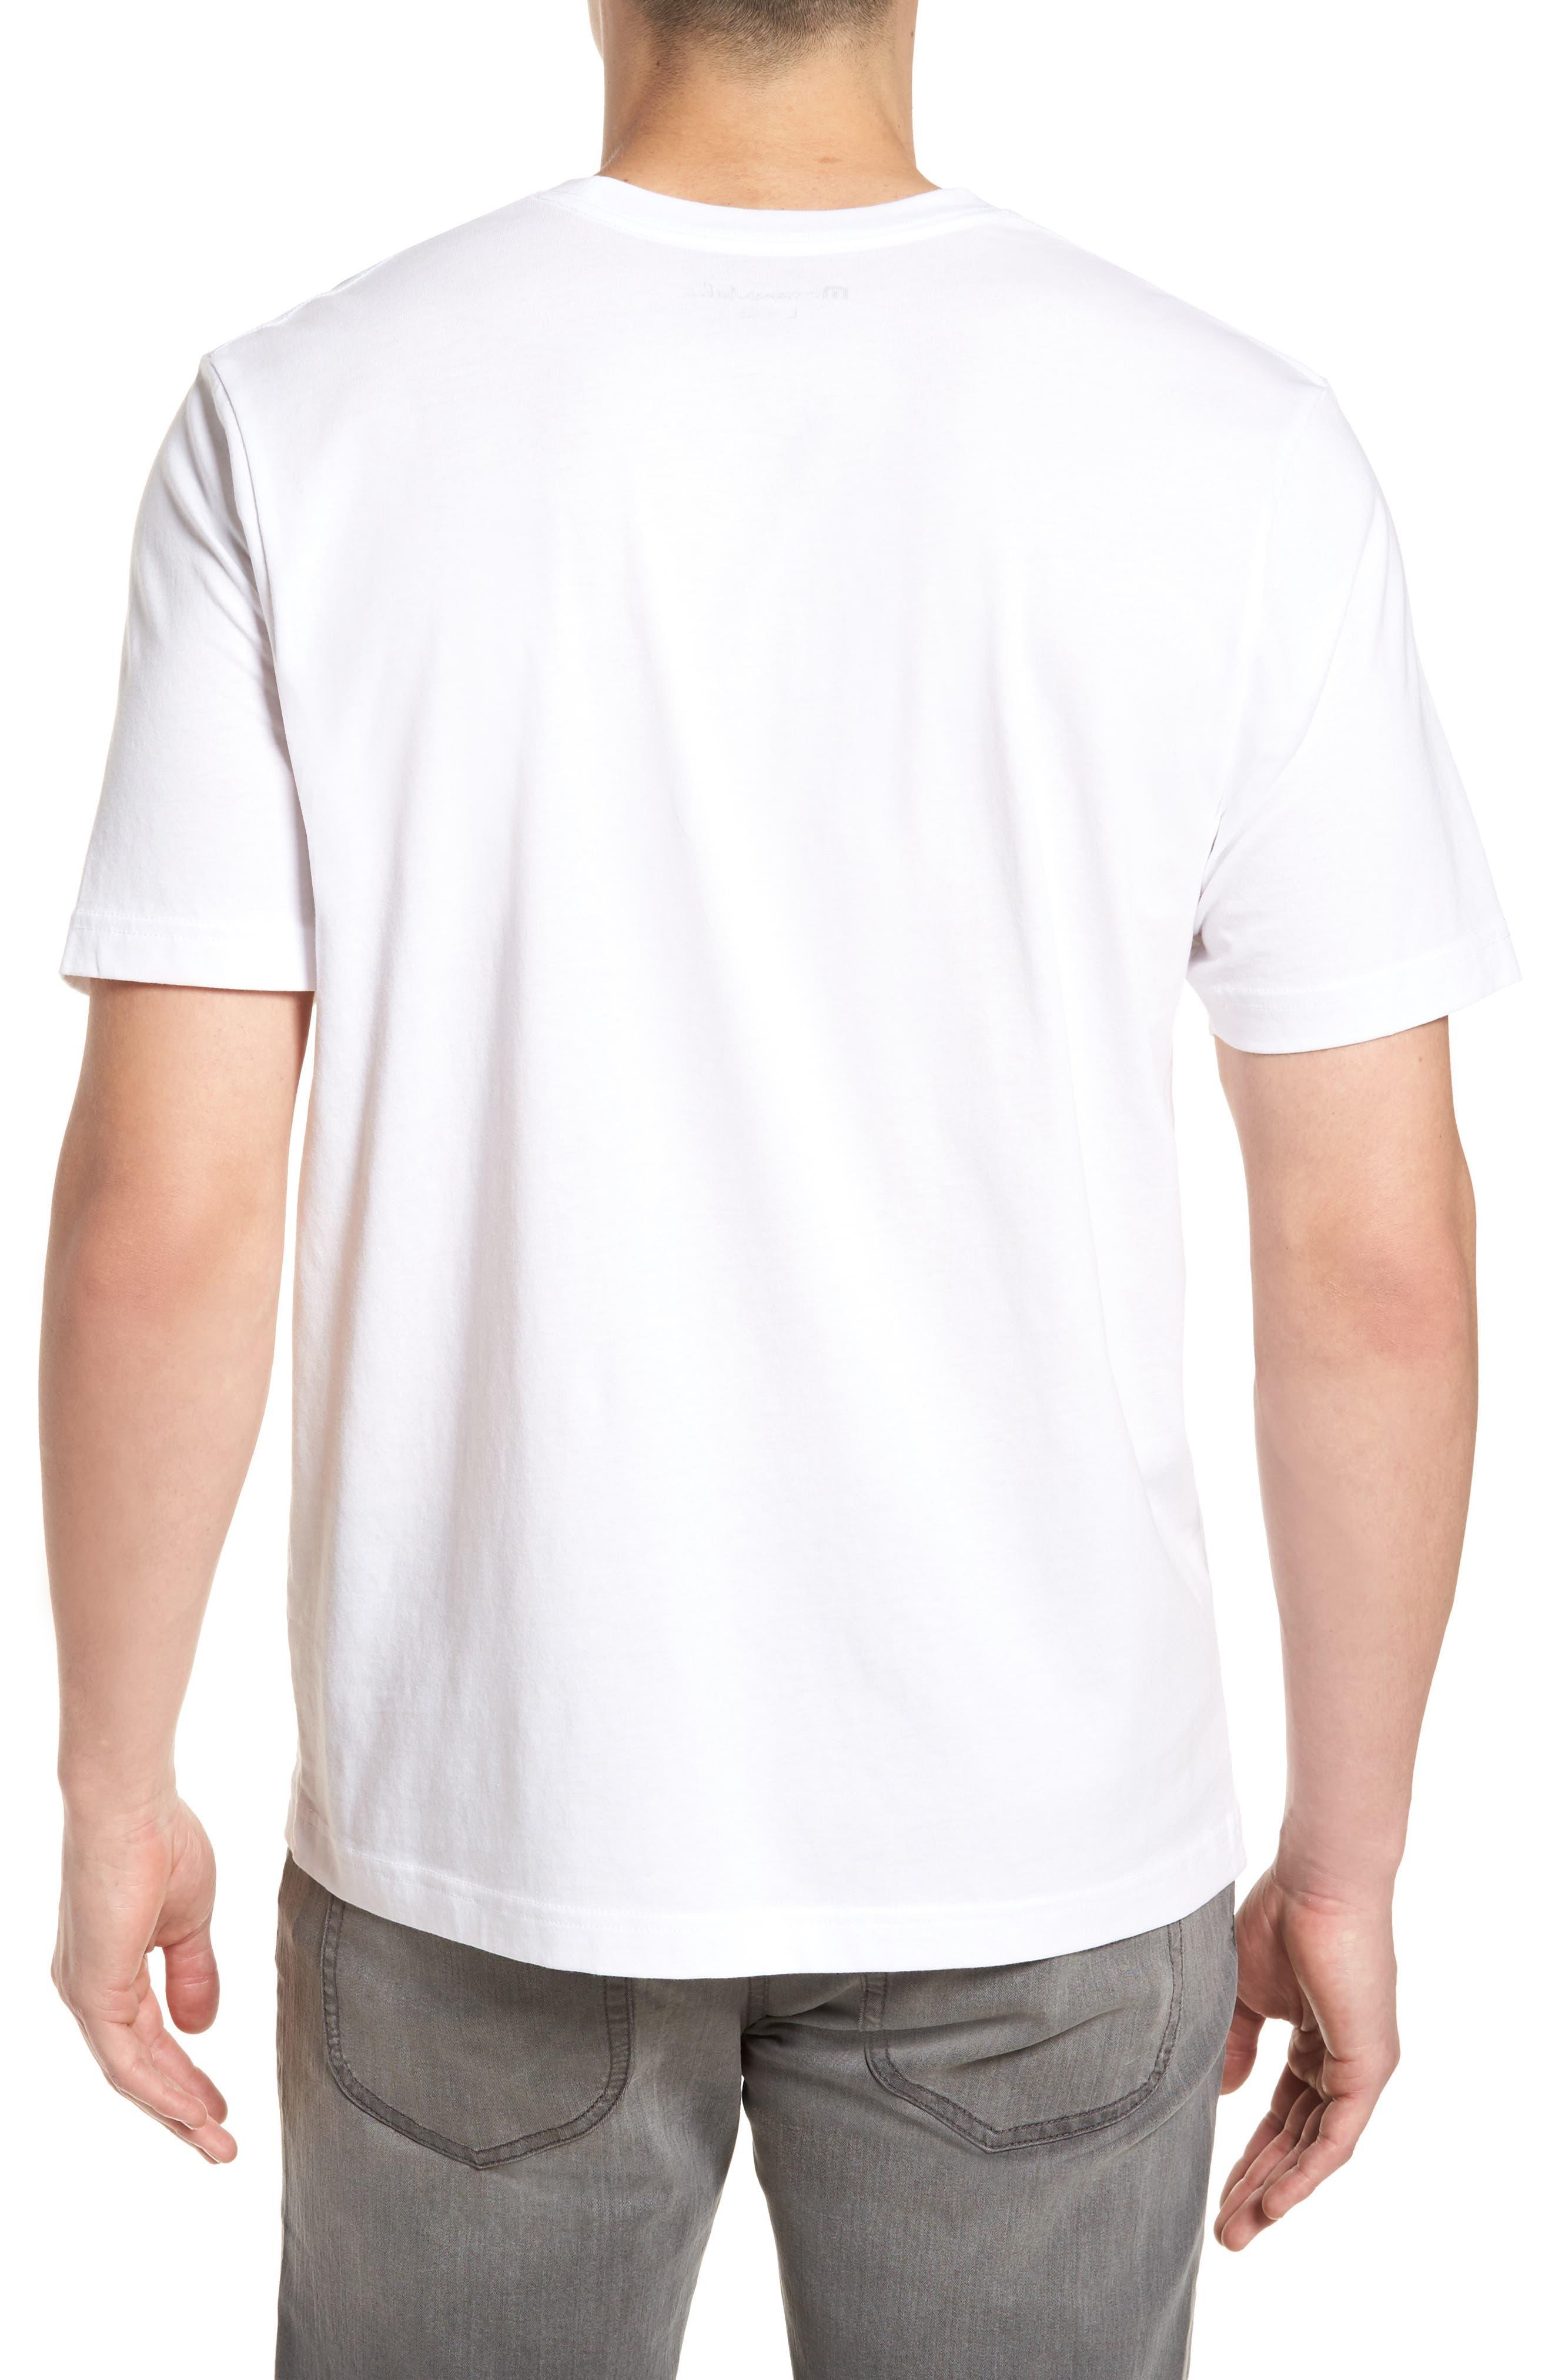 Play Hard Graphic T-Shirt,                             Alternate thumbnail 2, color,                             100